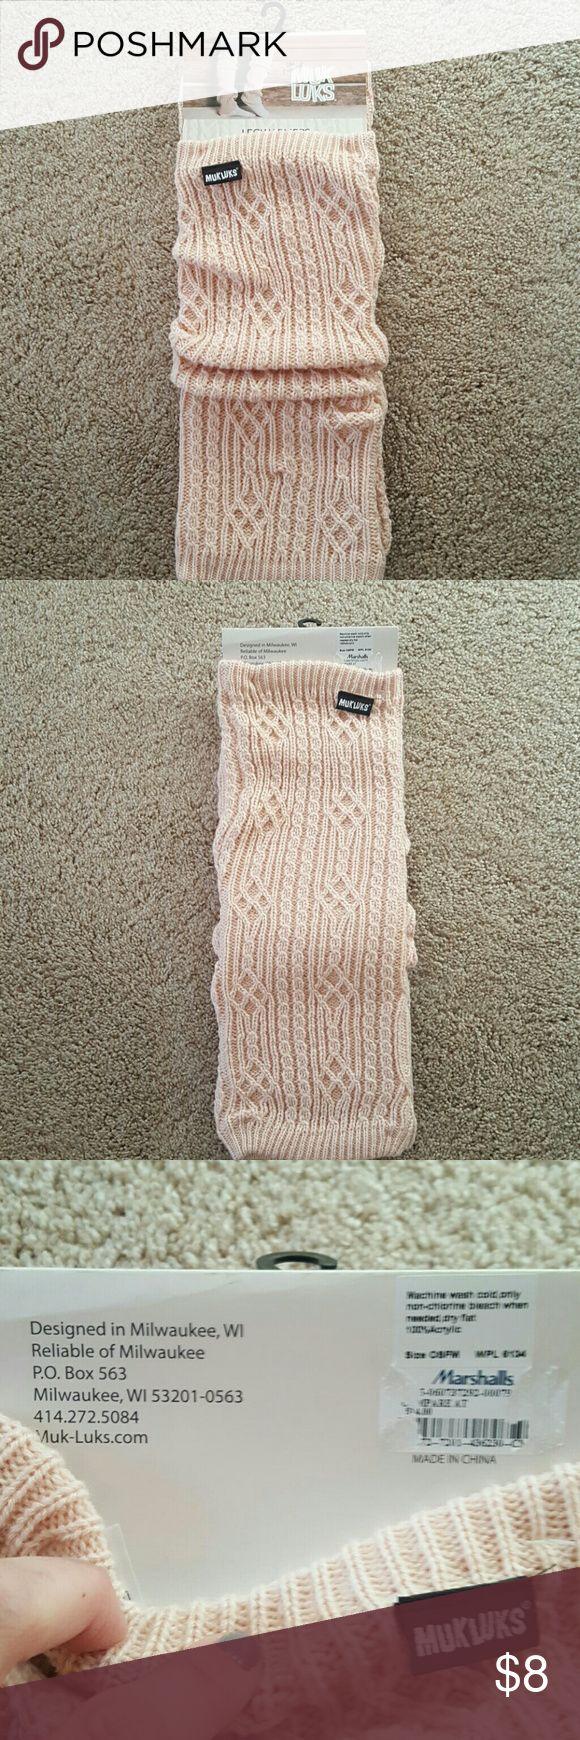 Muk Luks leg warmers. NWT Pale Pink Muk Luk leg warmers. NWT Muk Luks Accessories Hosiery & Socks